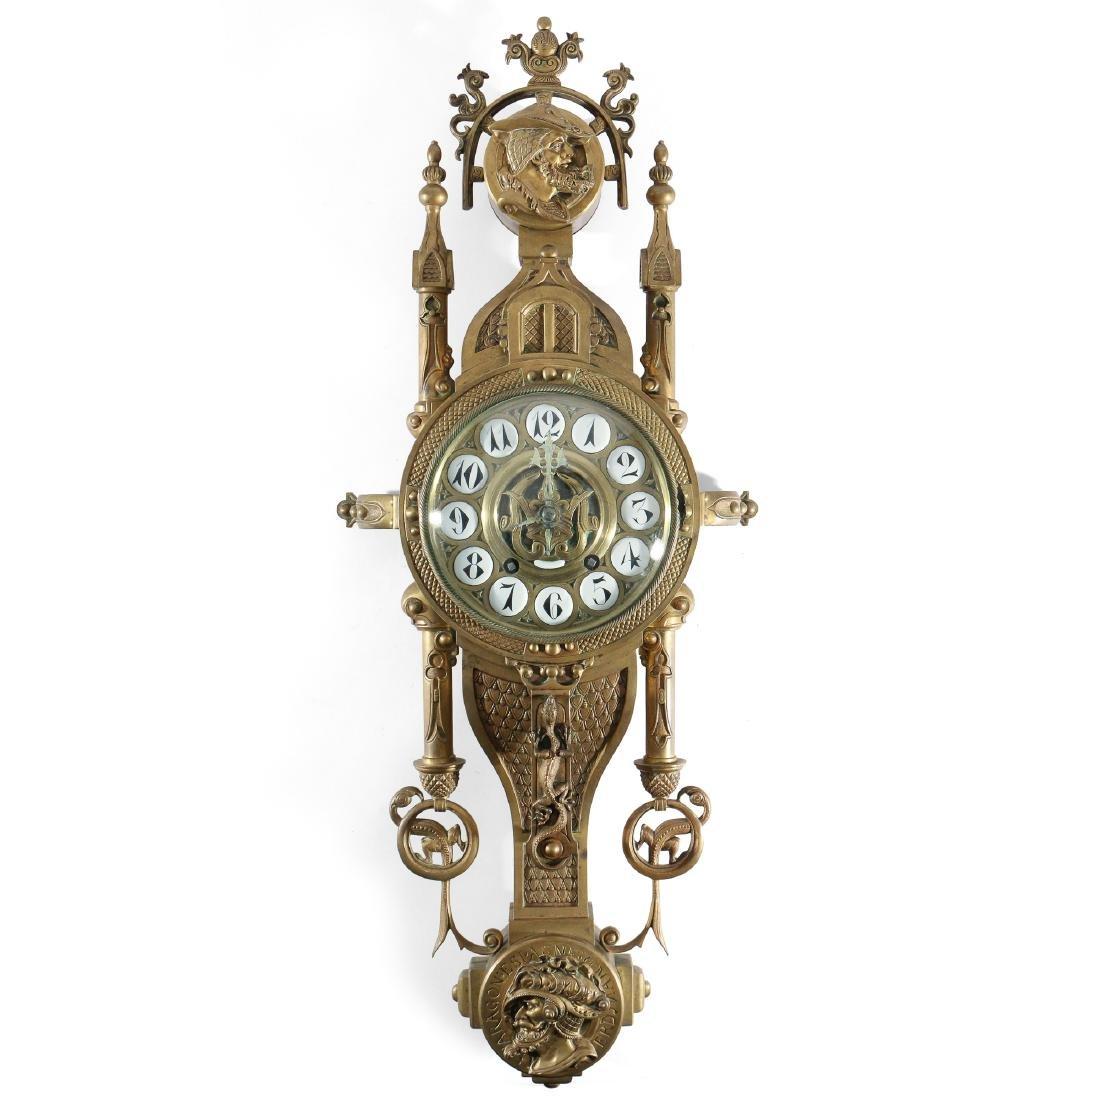 UNUSUAL CONTINENTAL BRONZE CARTEL CLOCK